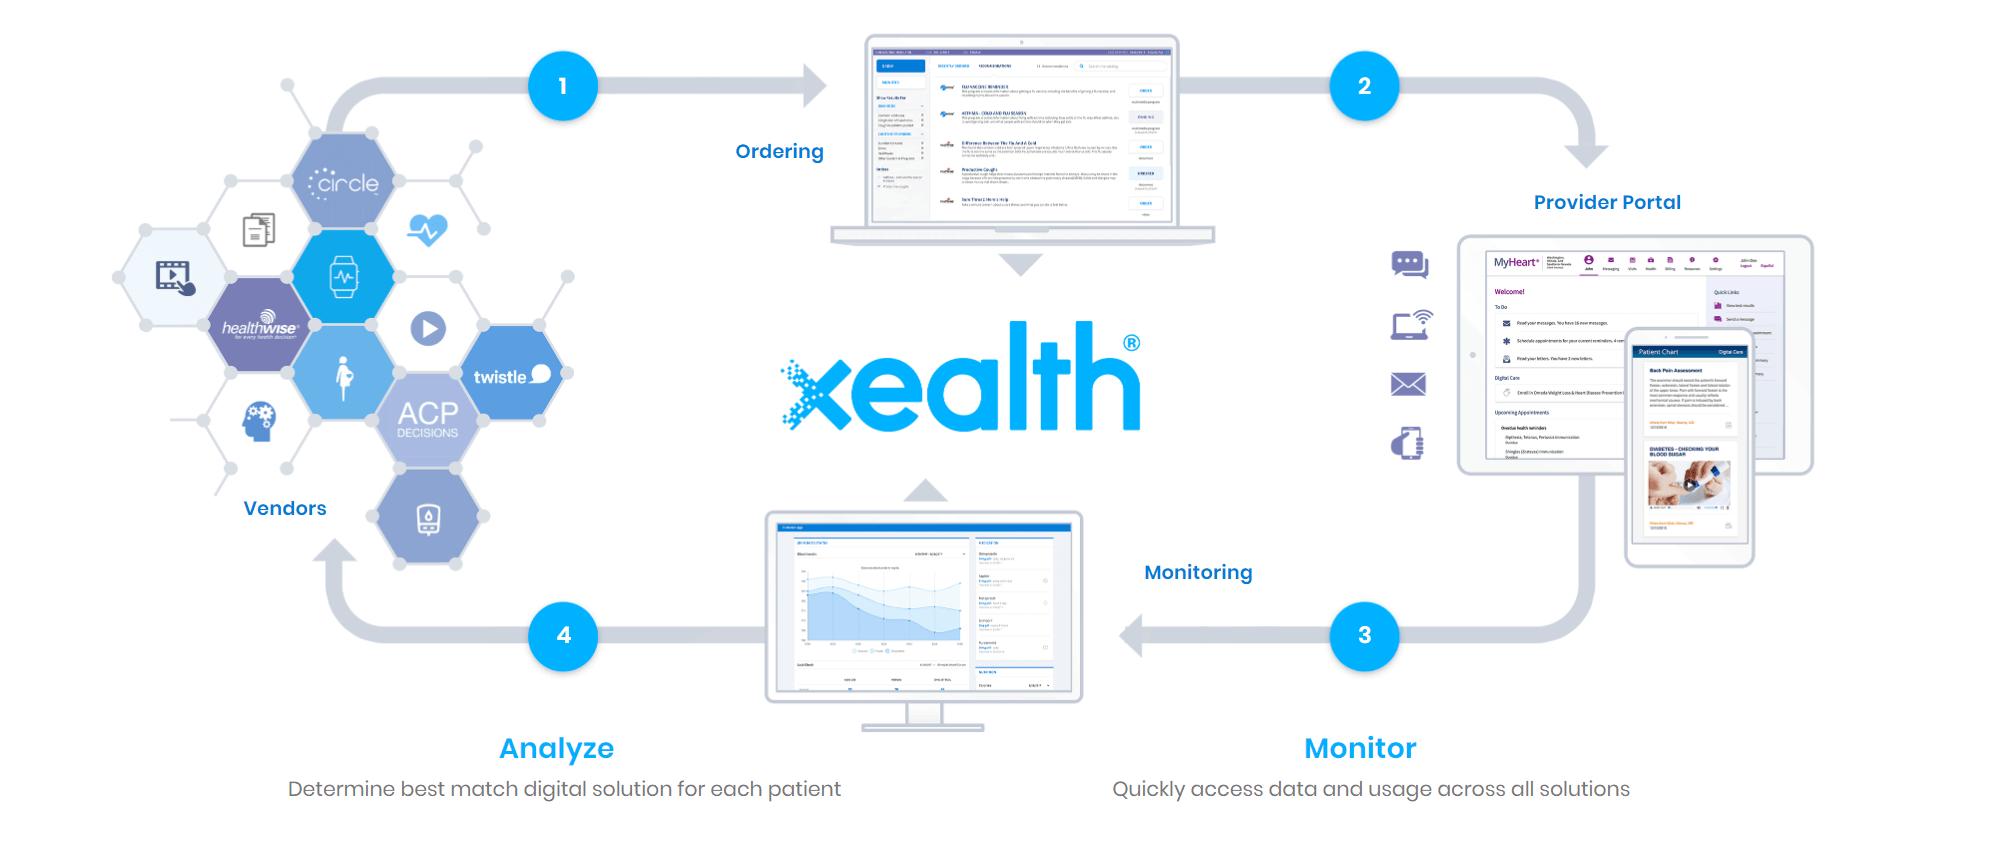 Digital Prescribing Platform Xealth Raises $11M to Expand Digital Health Tools